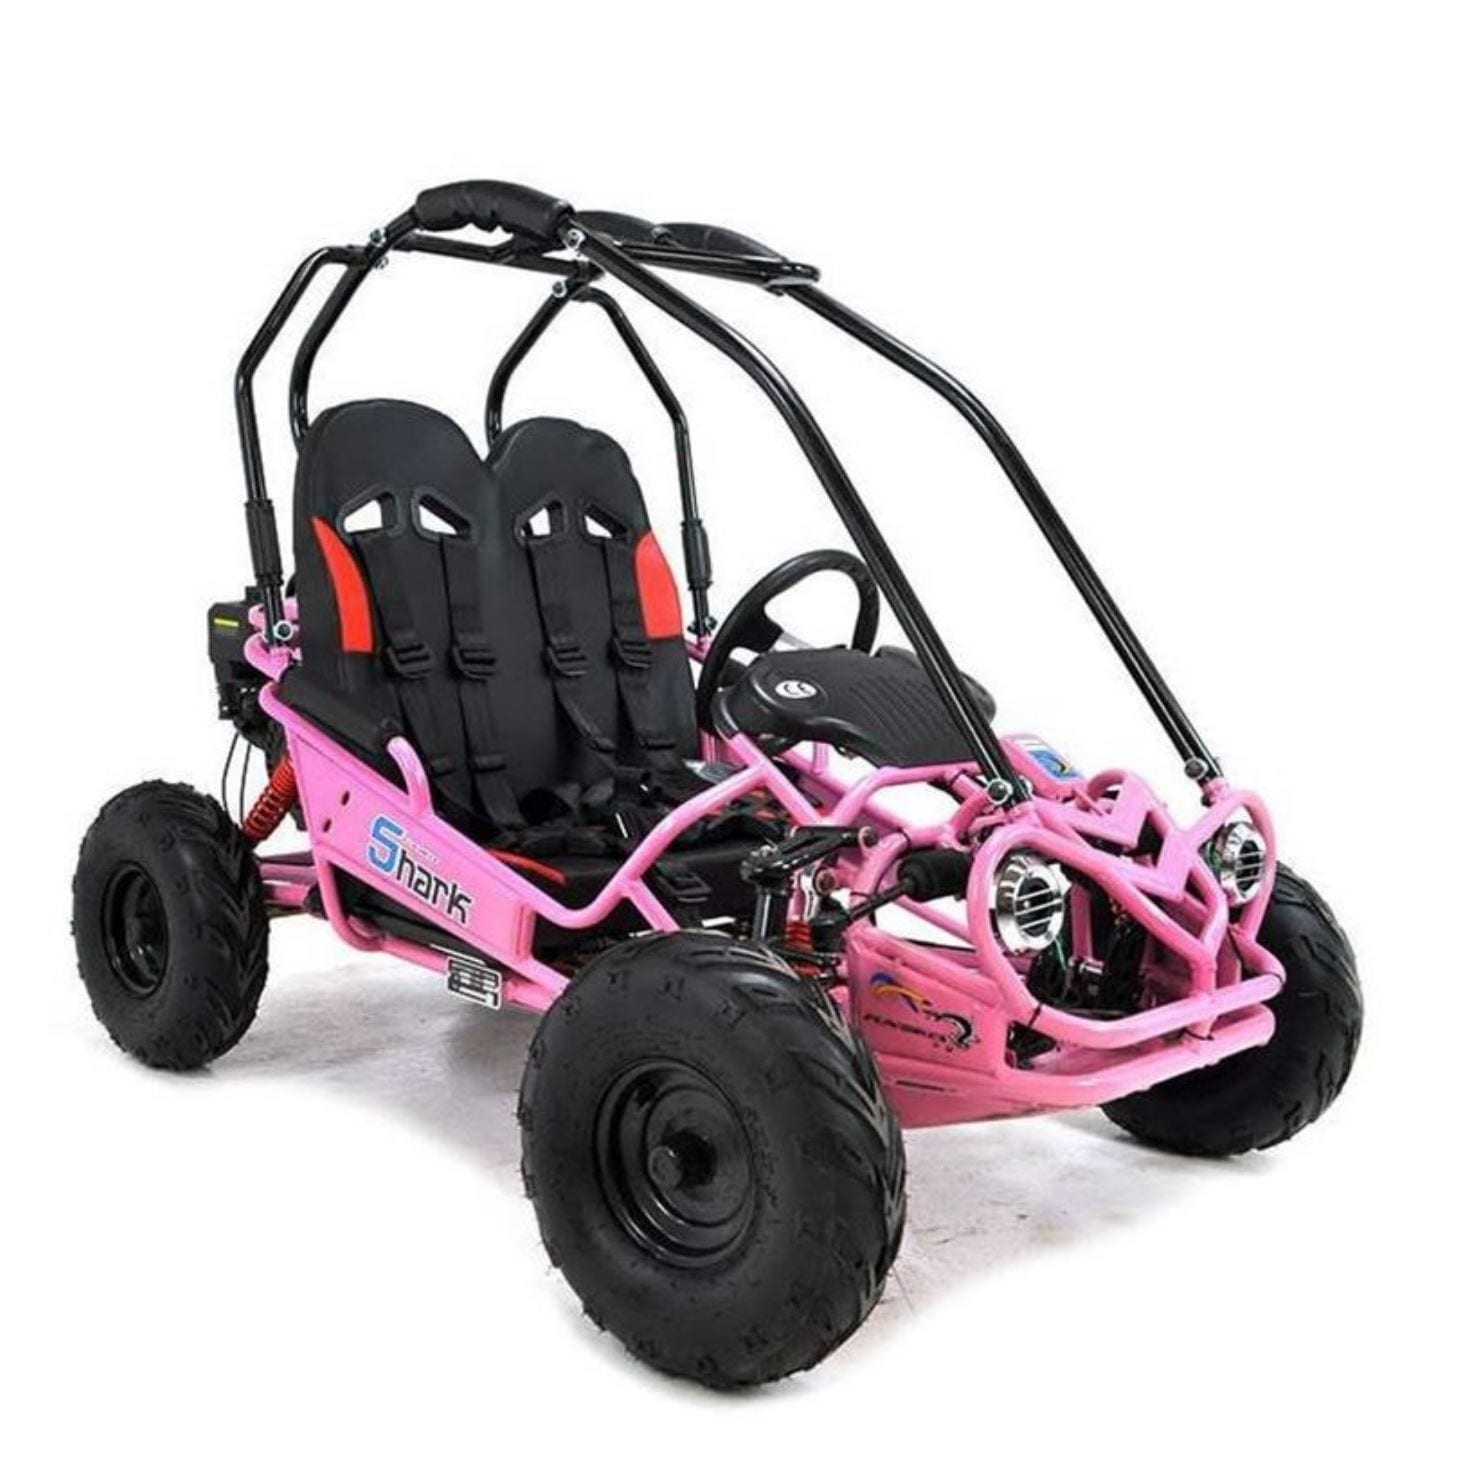 Mudrocks GT50 in pink